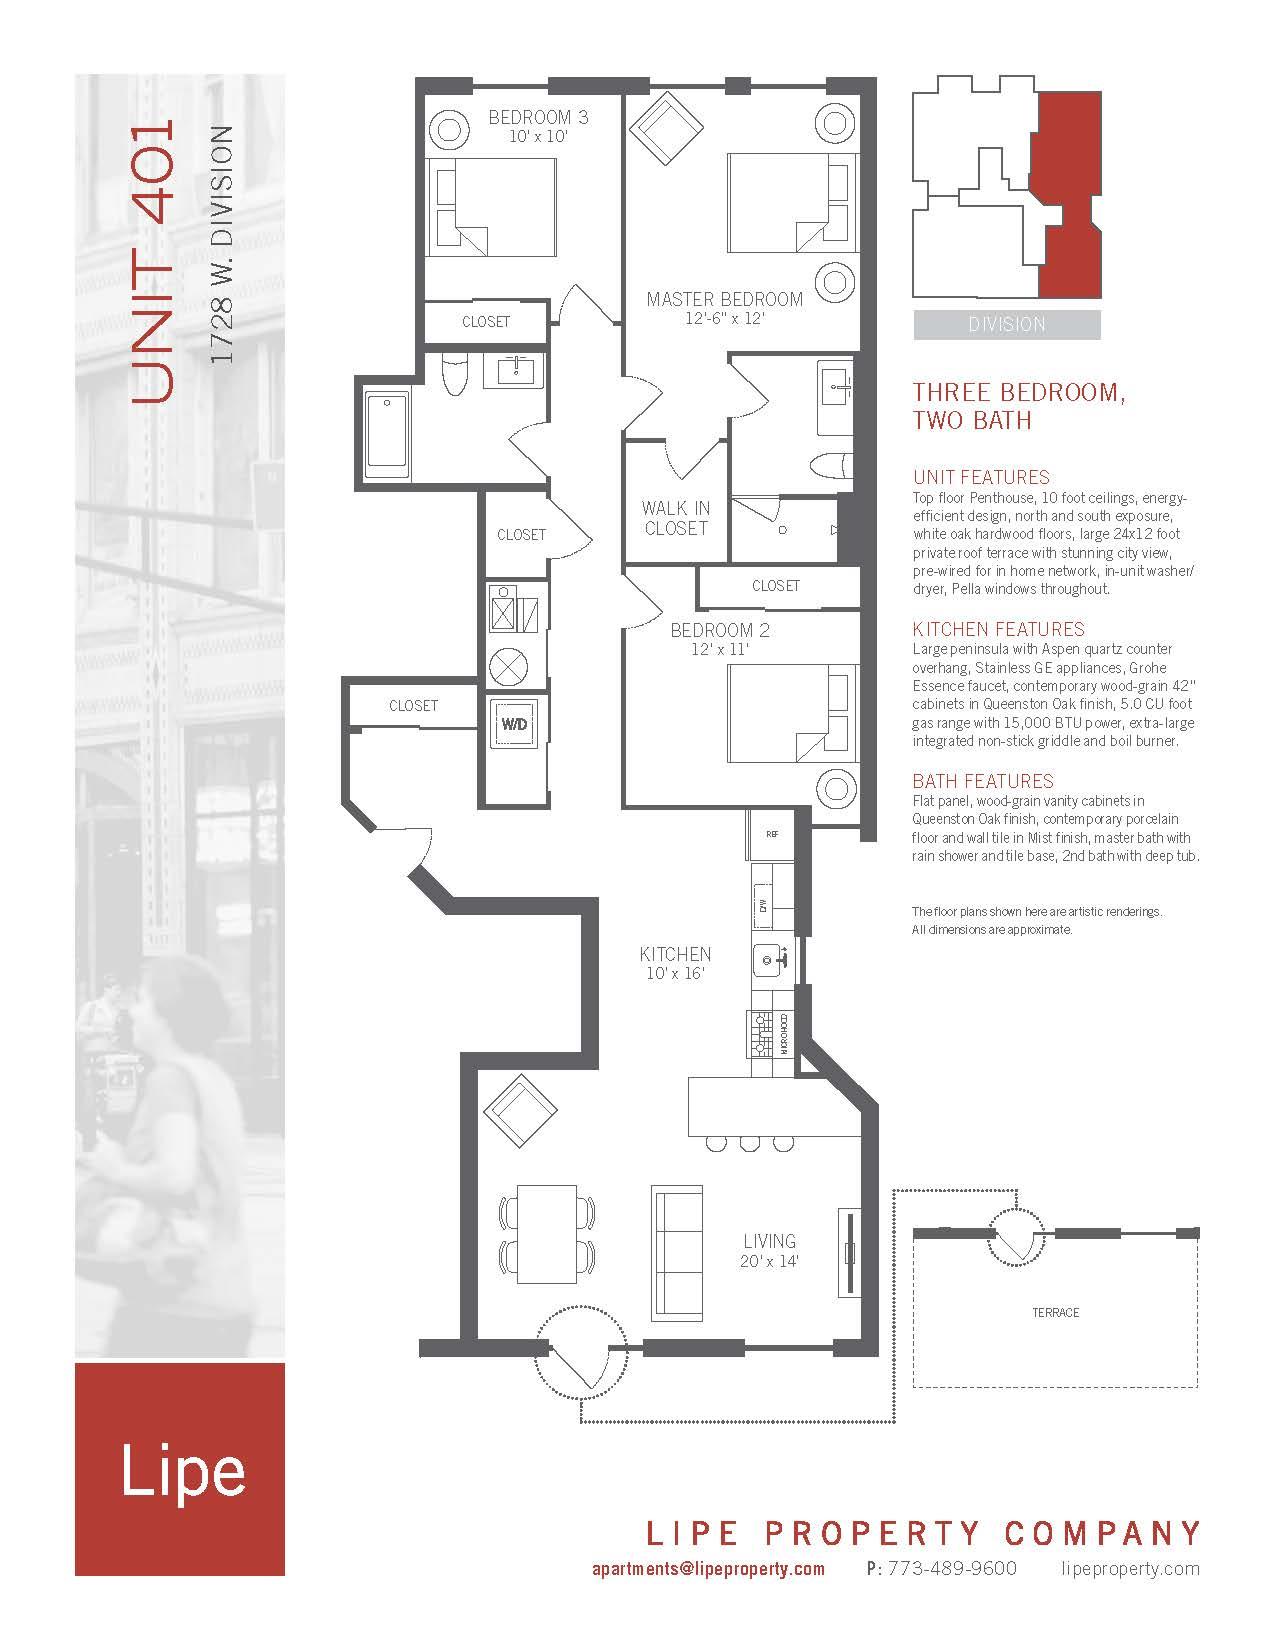 1728-West-Division-401-Floorplan-Chicago-apartment-for-rent.jpg